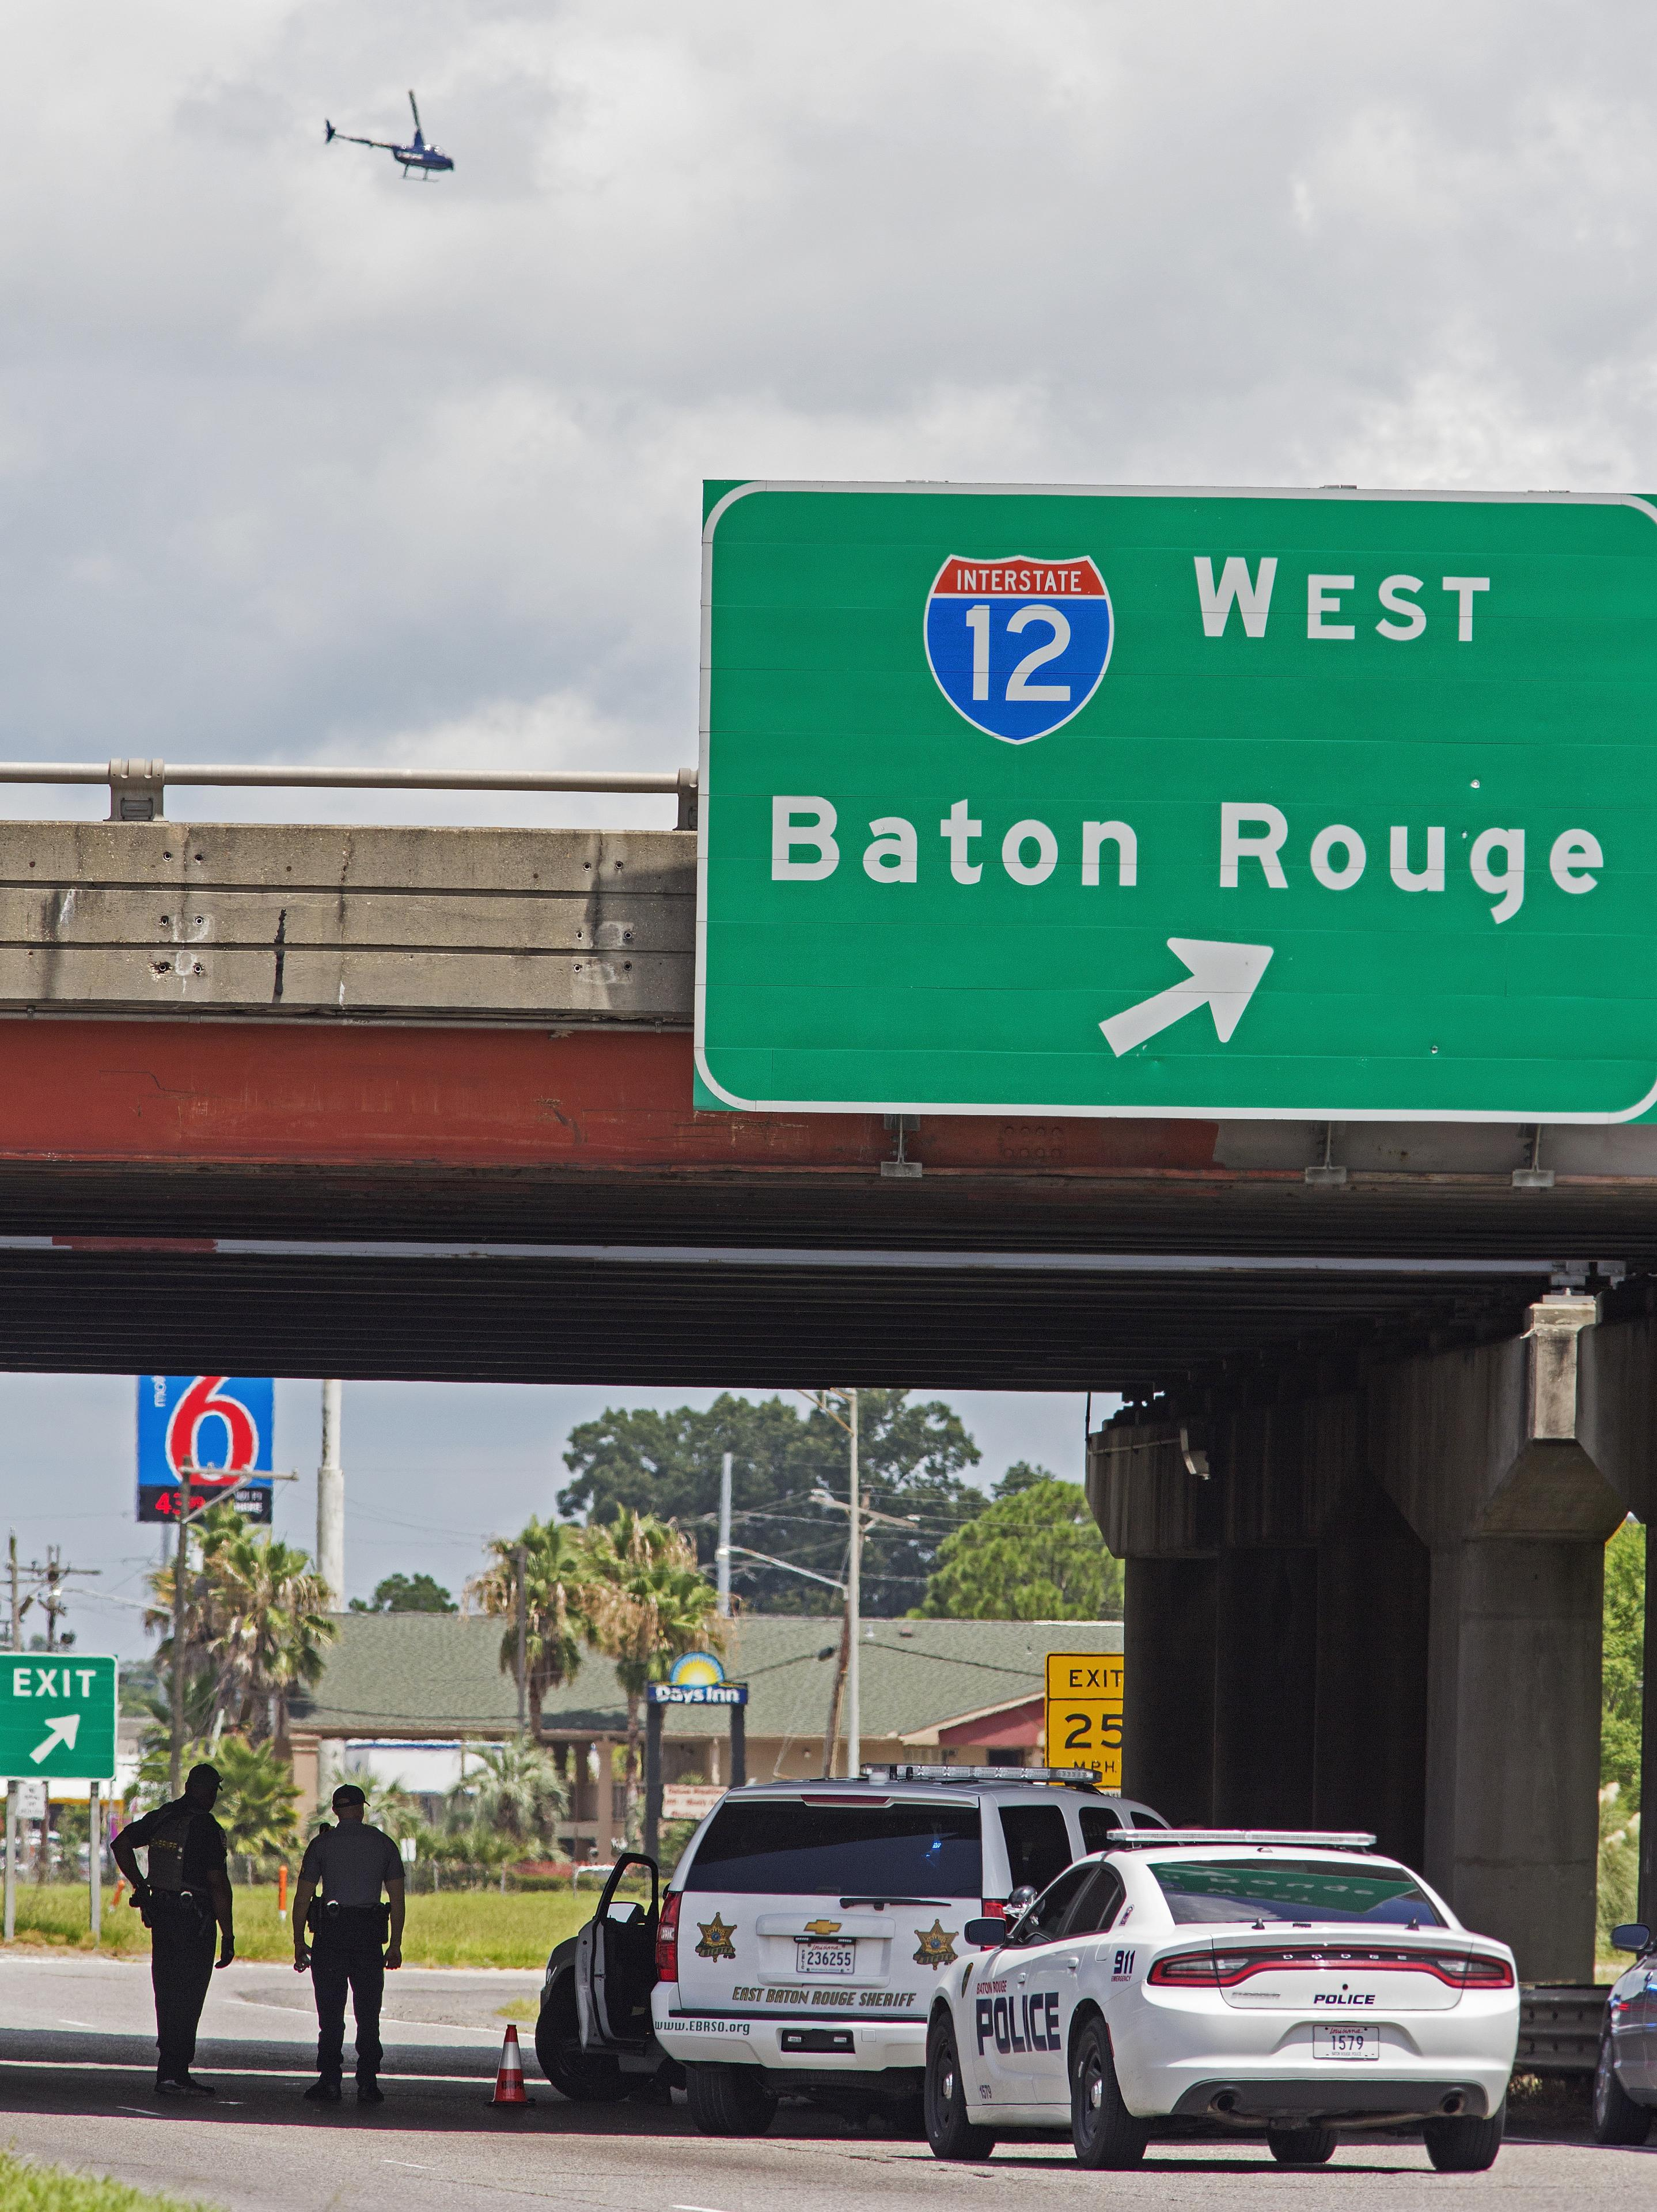 Sheer brutality': Police detail Baton Rouge shooting scene